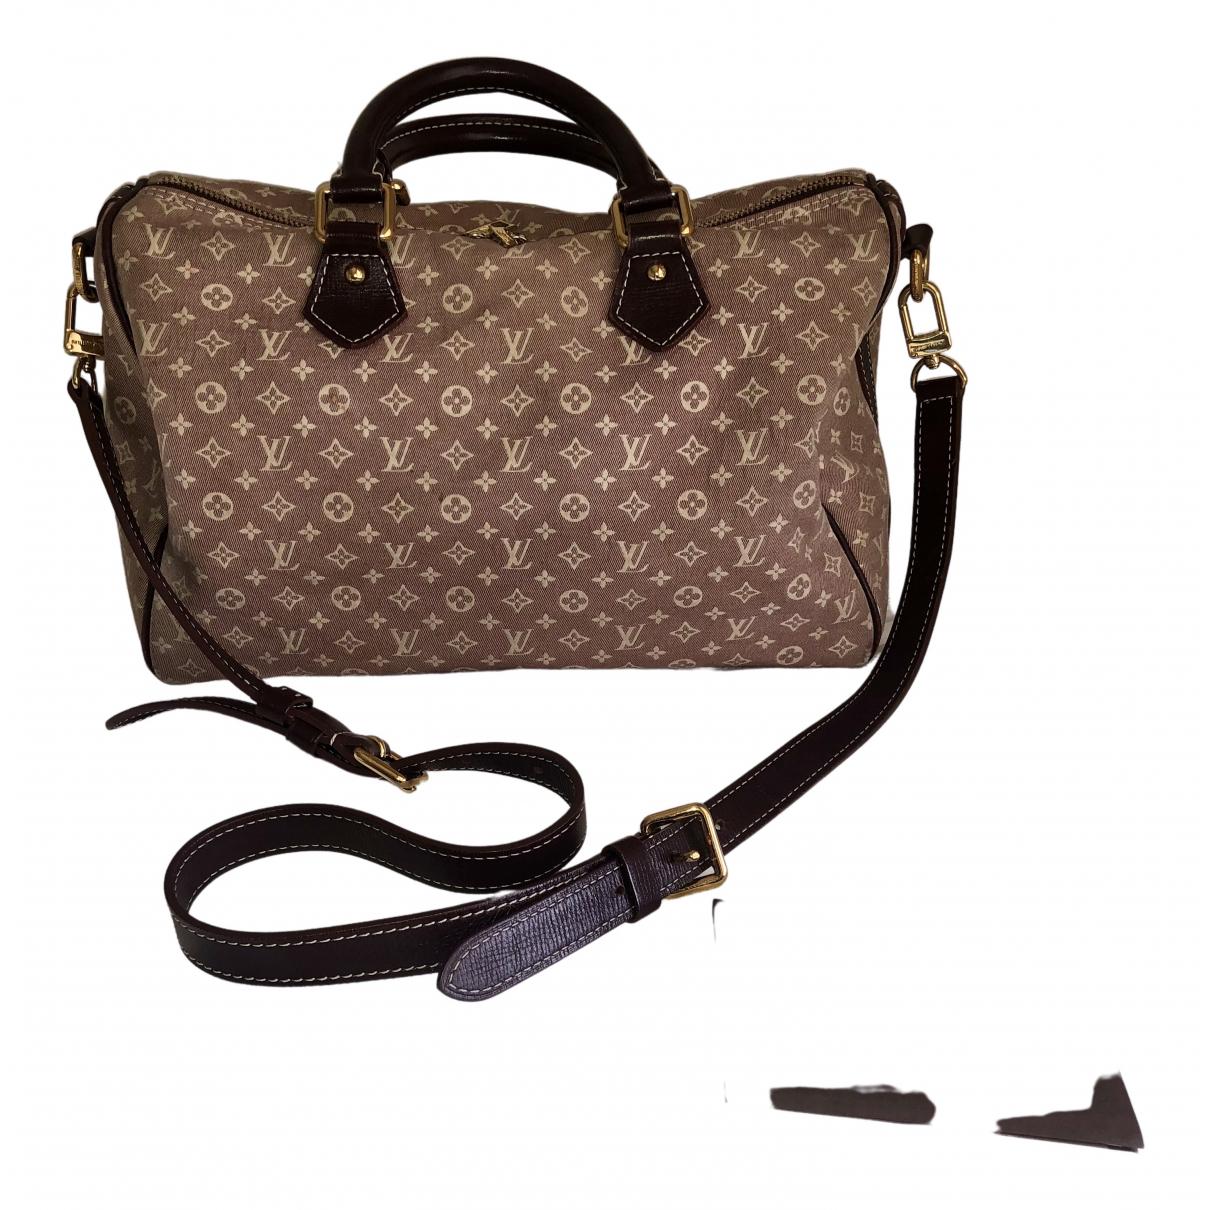 Louis Vuitton Speedy Bandoulière Pink Cloth handbag for Women N